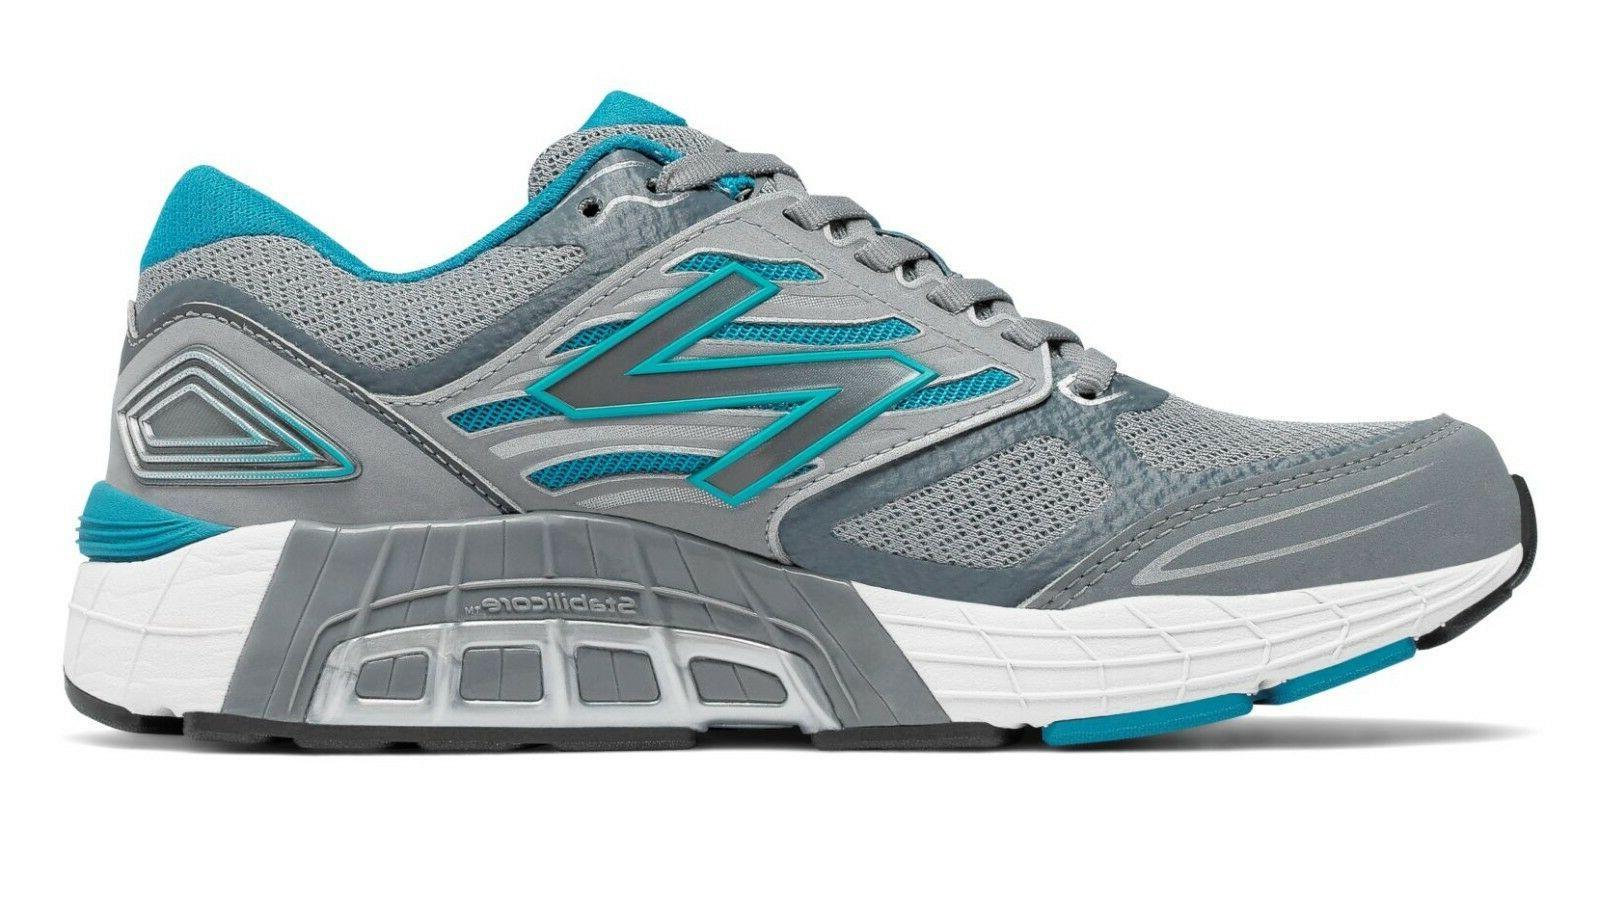 New Balance 1340v3 Cushioning Sneakers